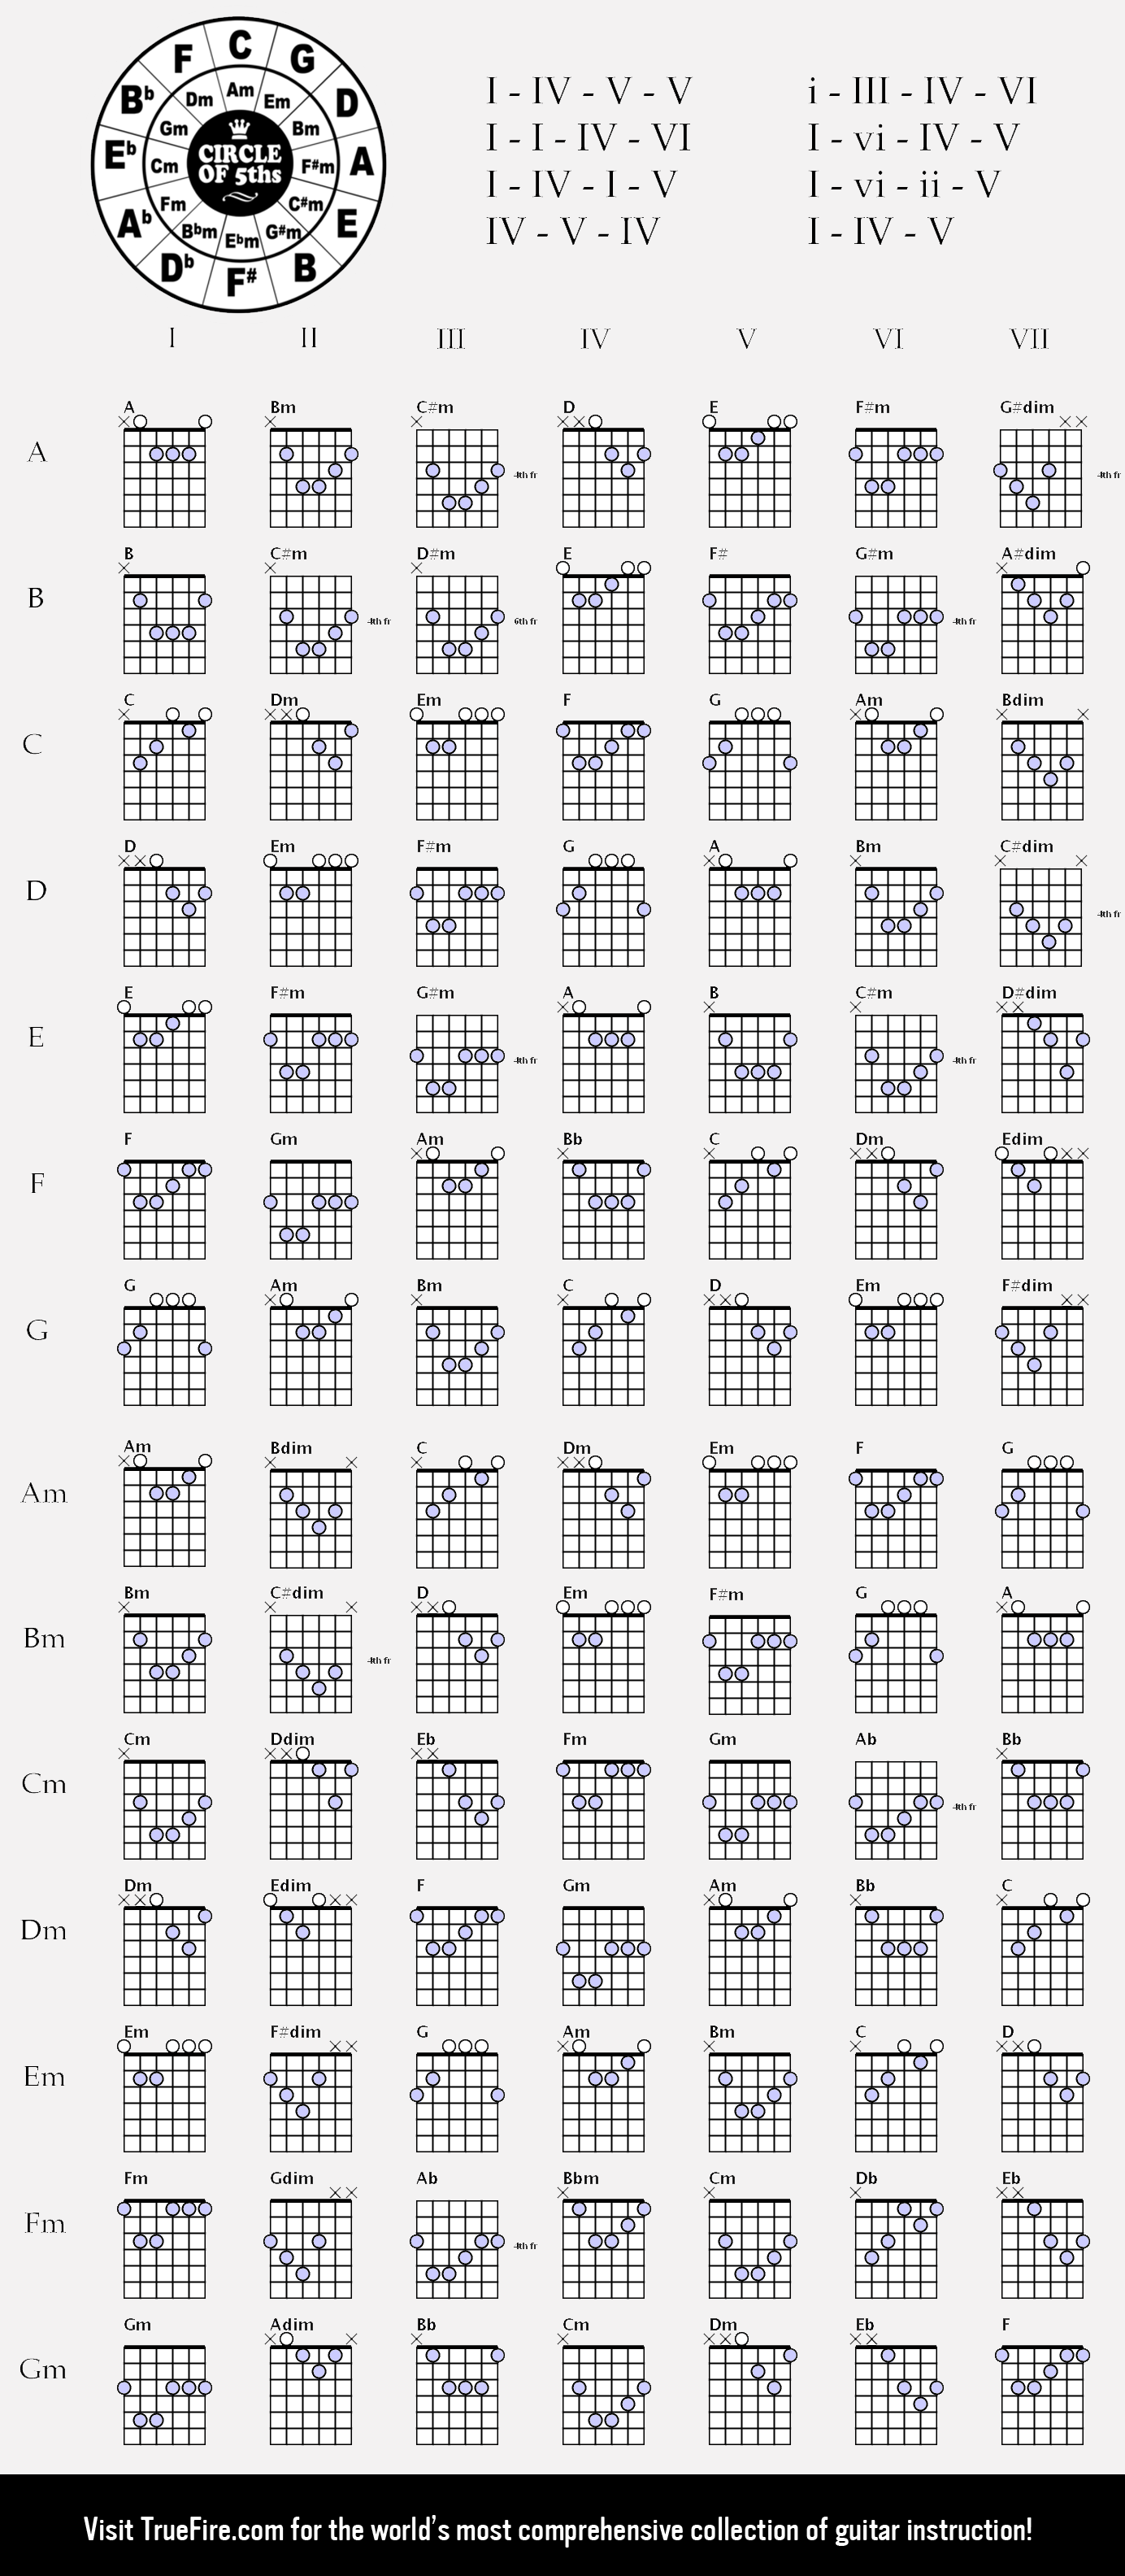 Ultimate Guitar Chord Chartg 13843168 Tips For Ukulele